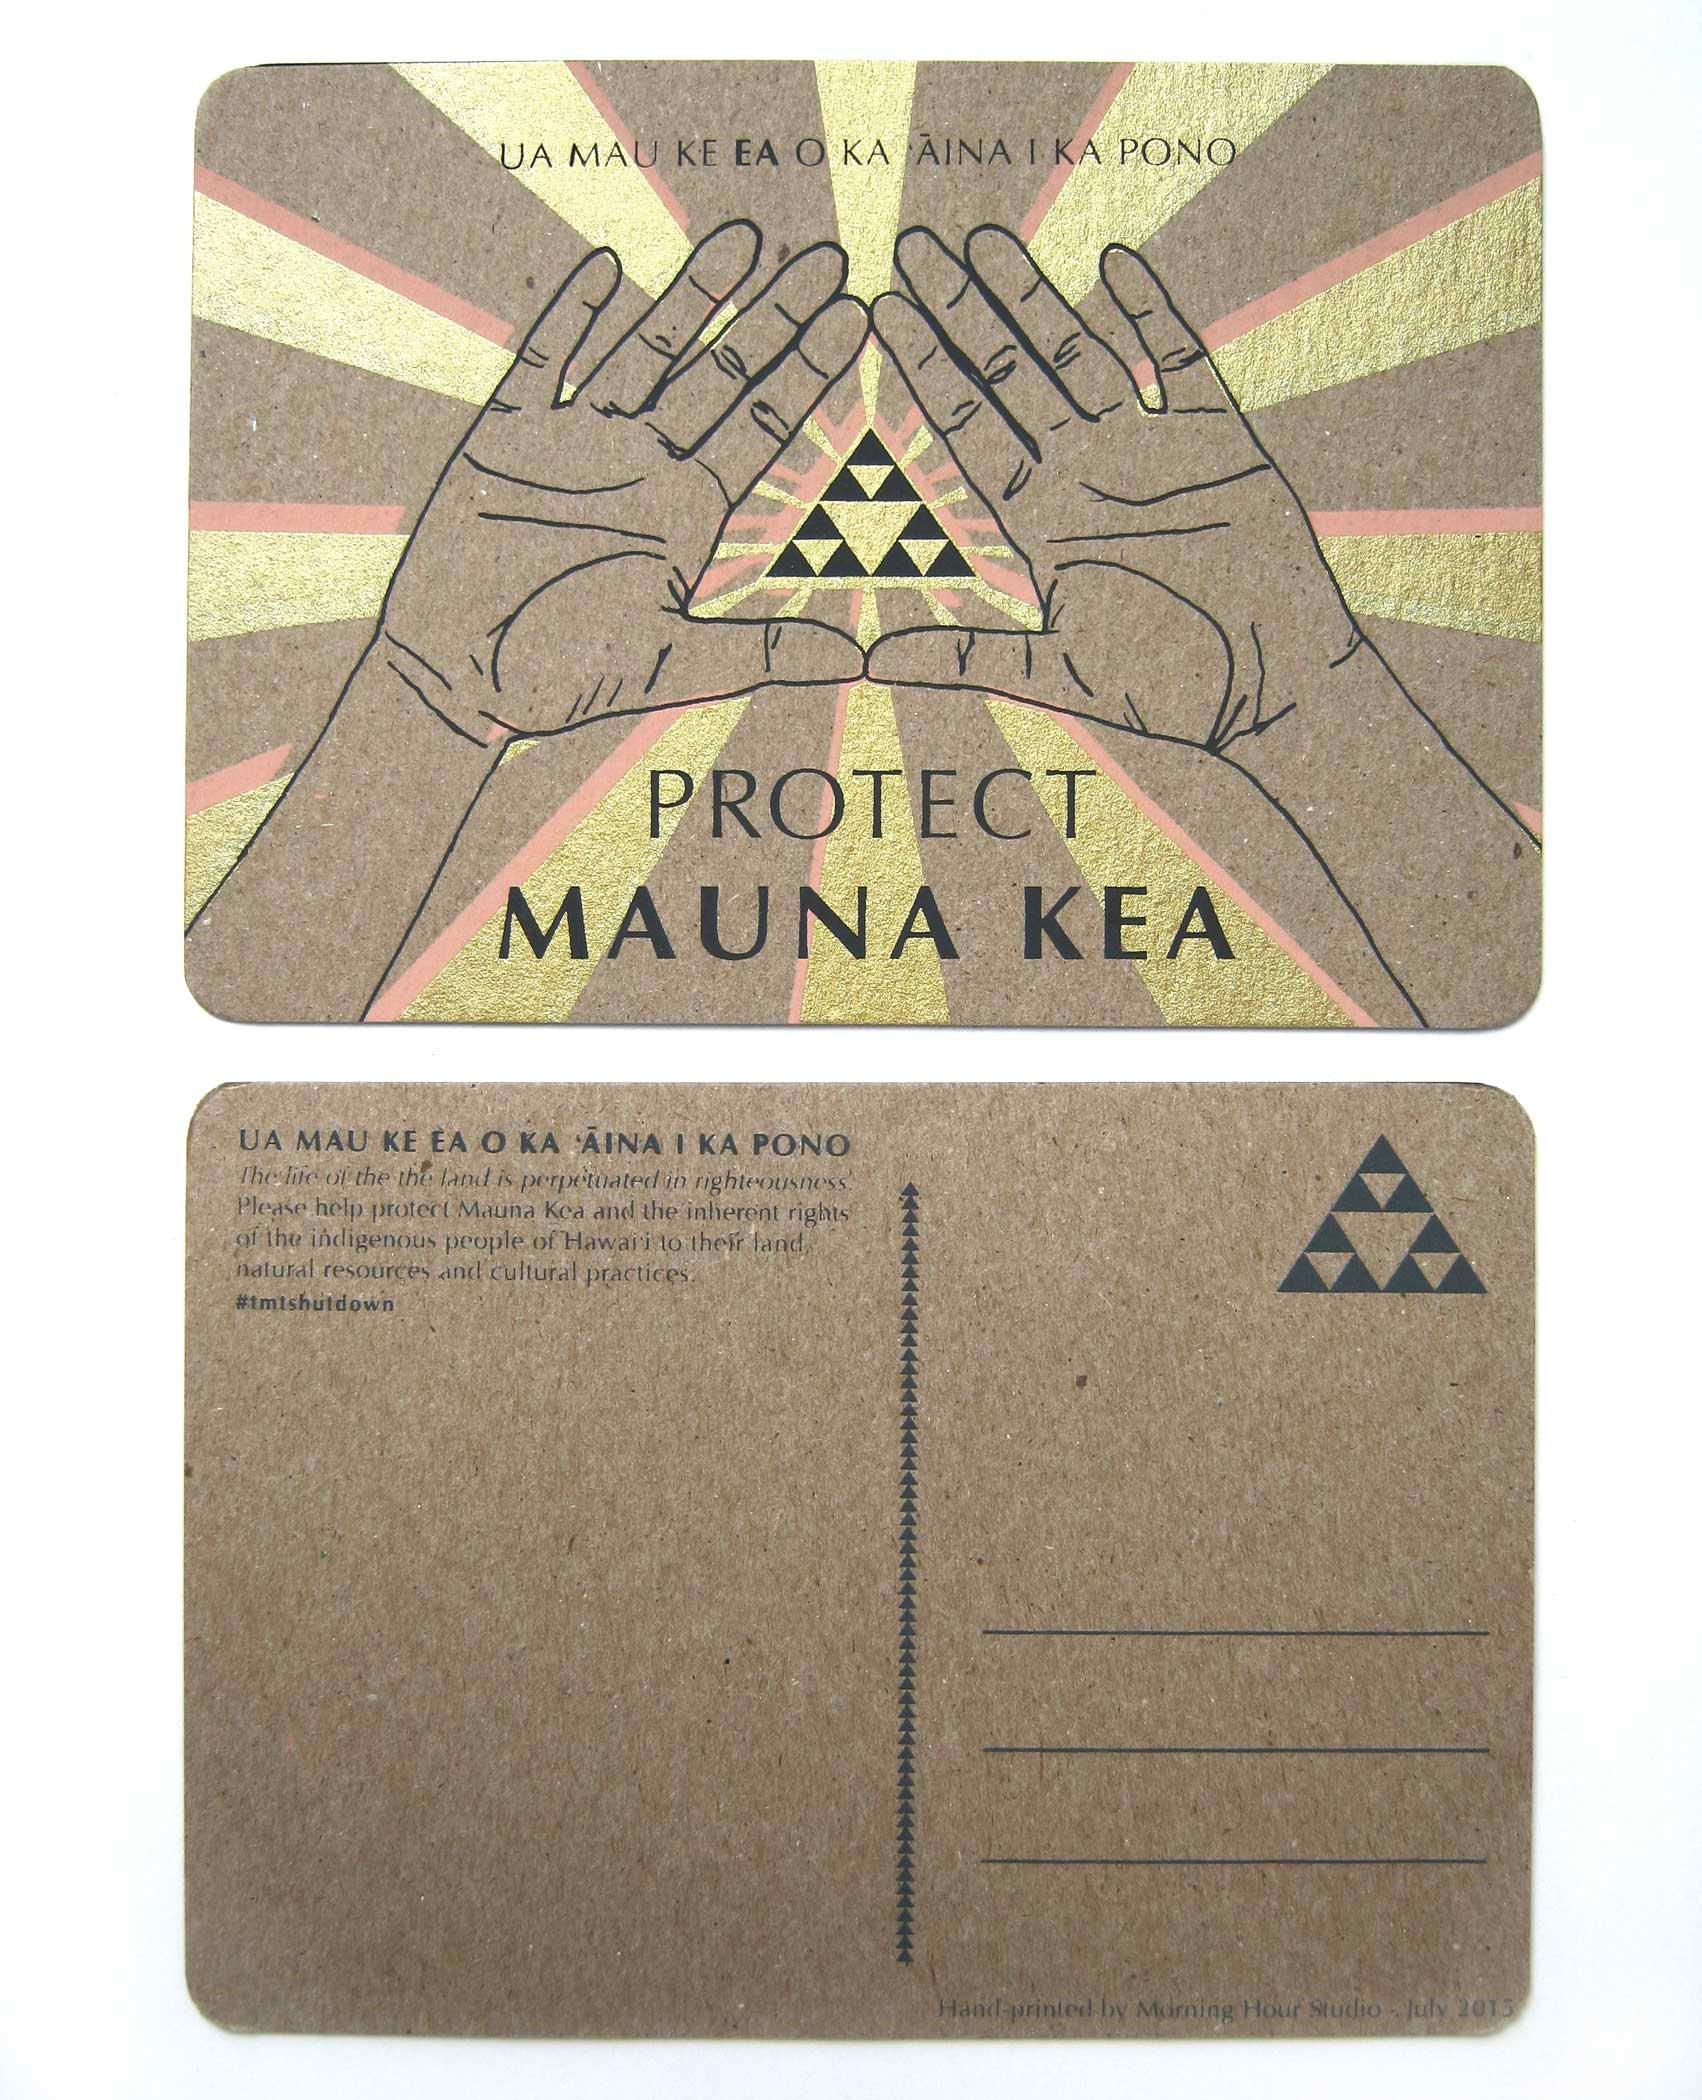 maunapostcards1.jpg